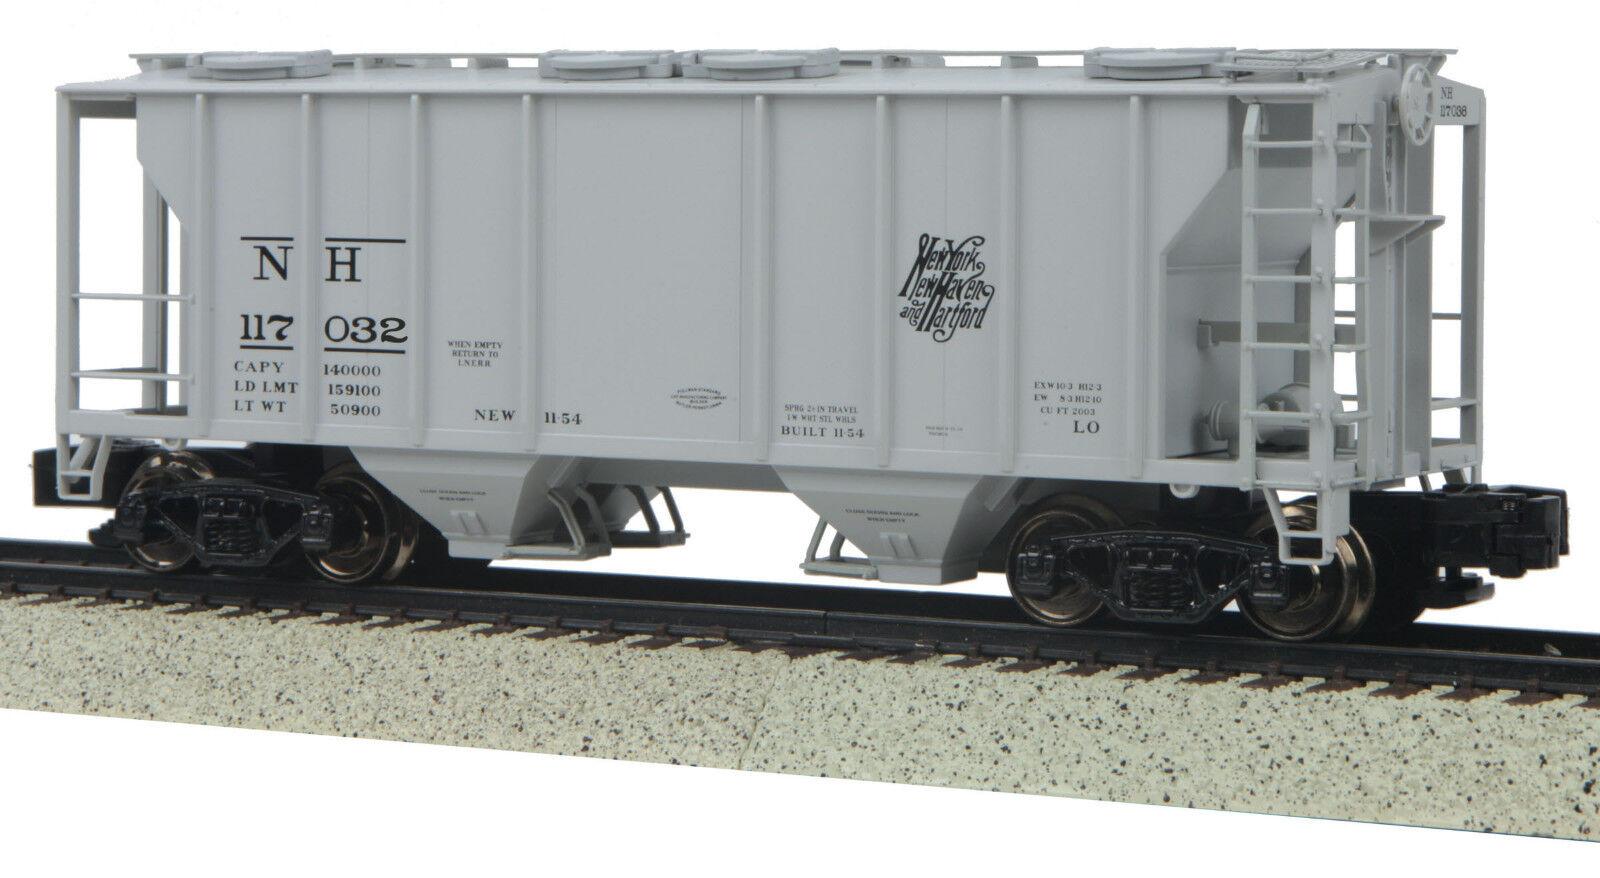 MTH S Gauge PS-2 Hopper Car New Haven 35-75053